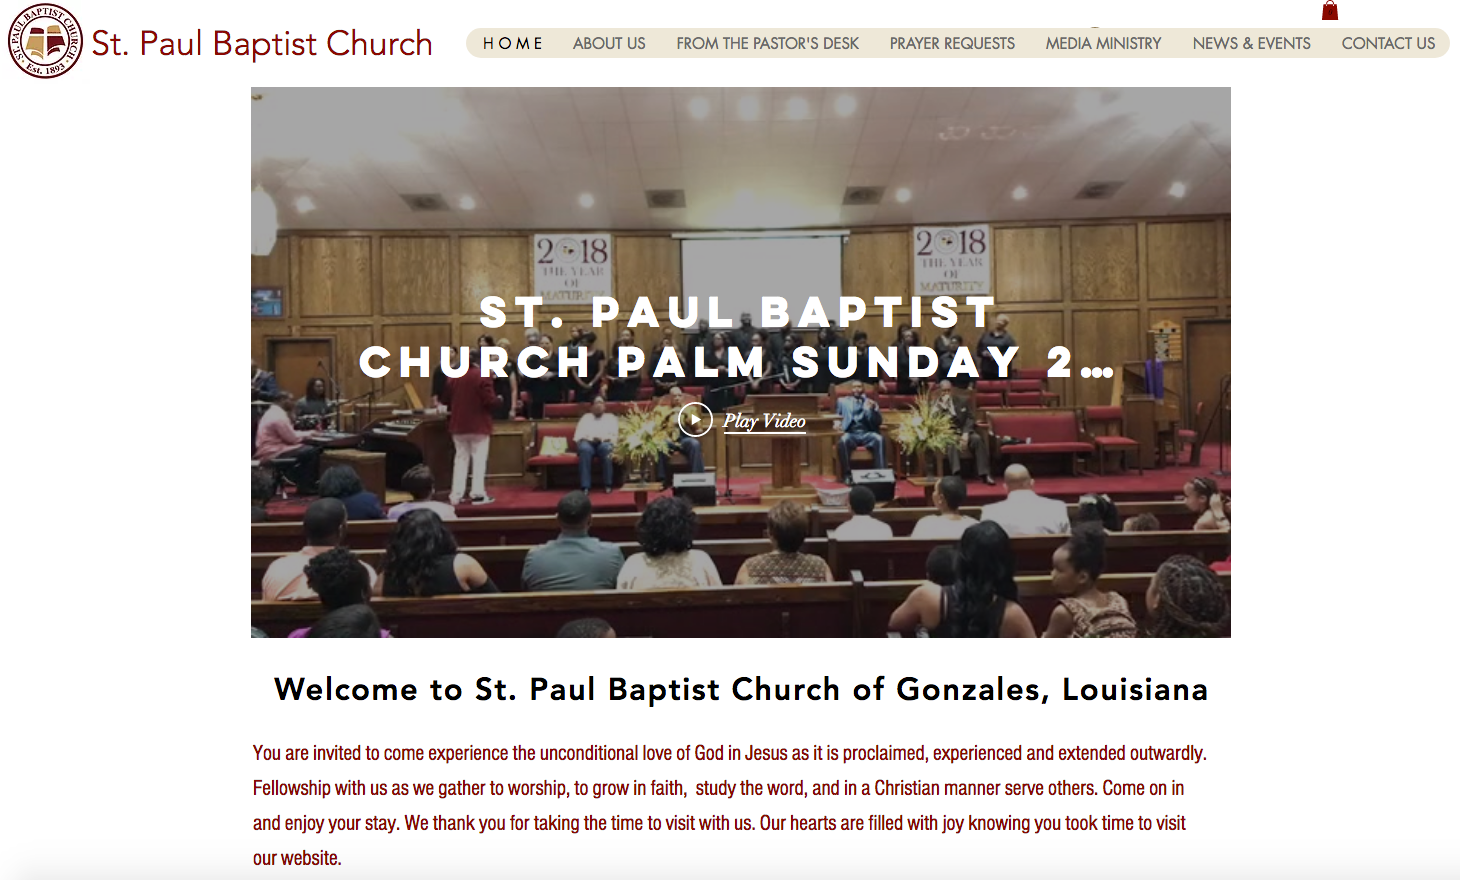 St. Paul Baptist Church Gonzales